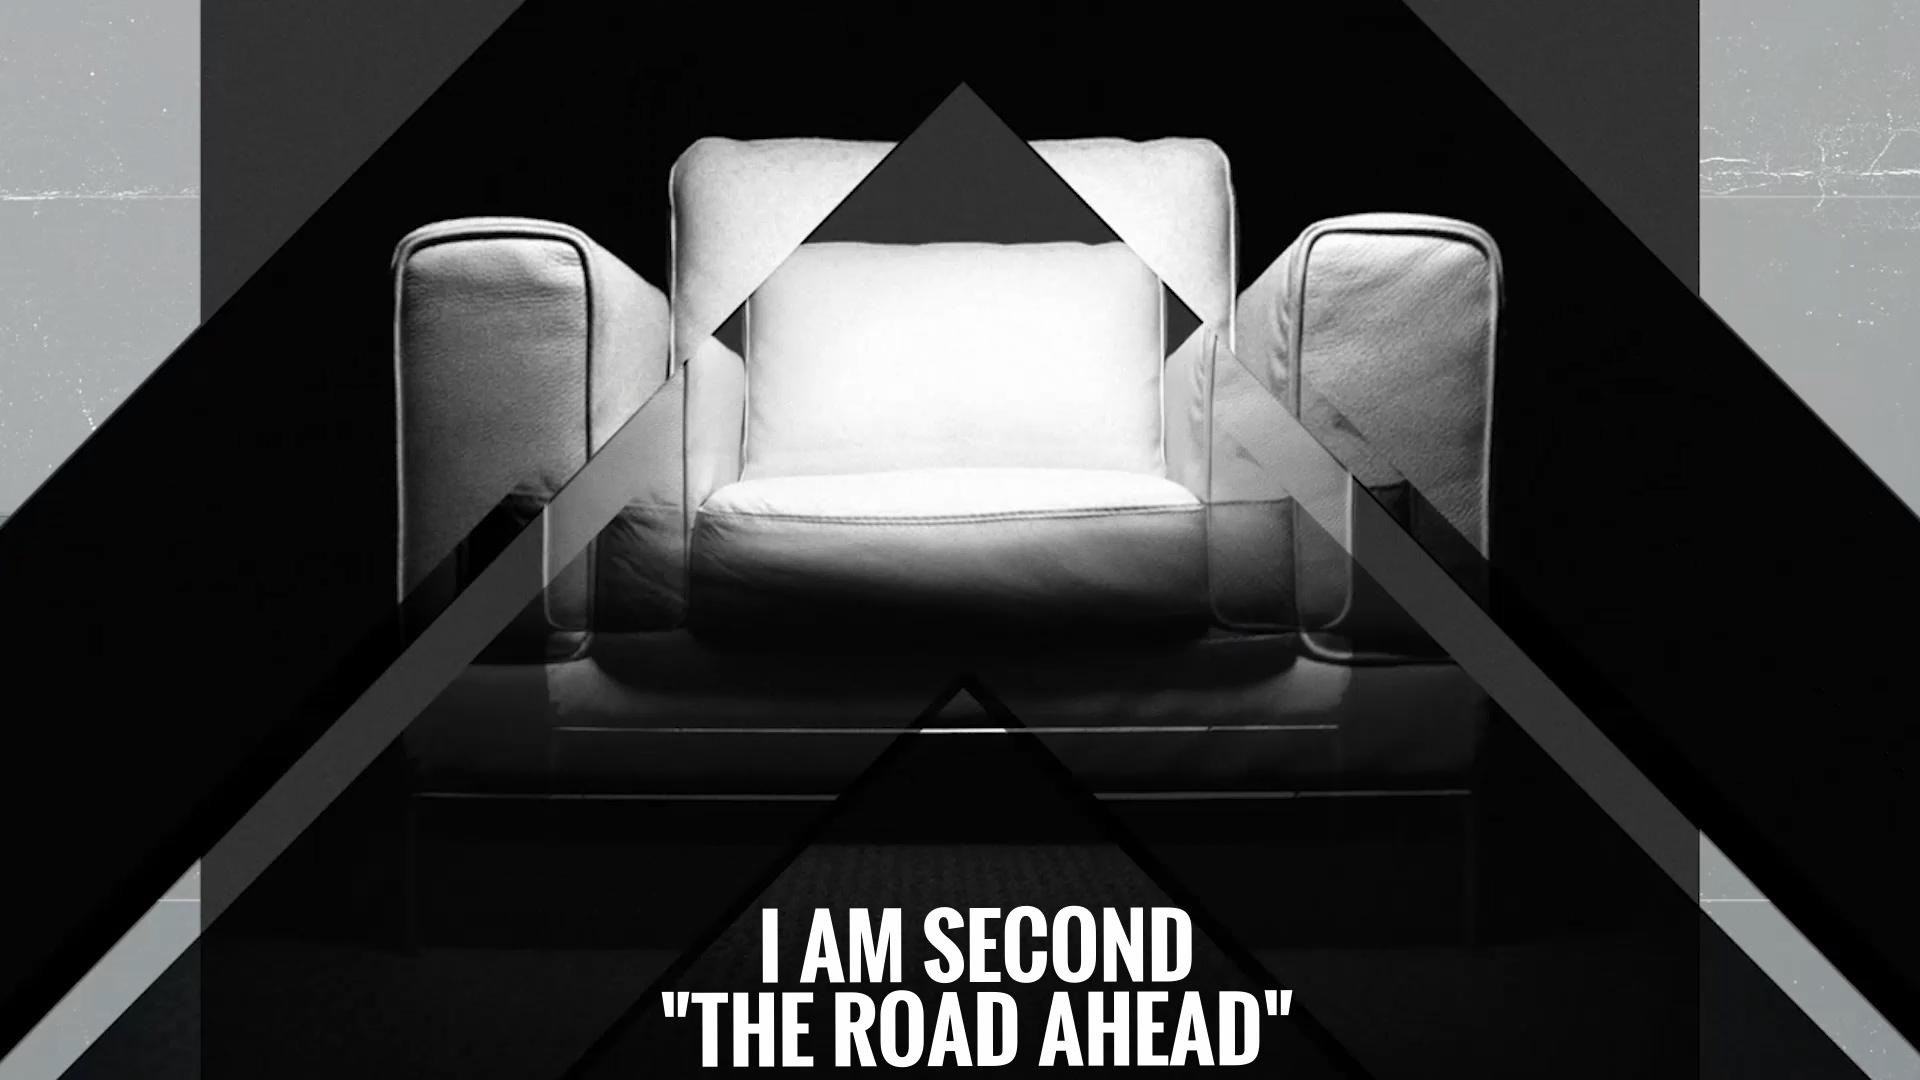 I am second1.jpg